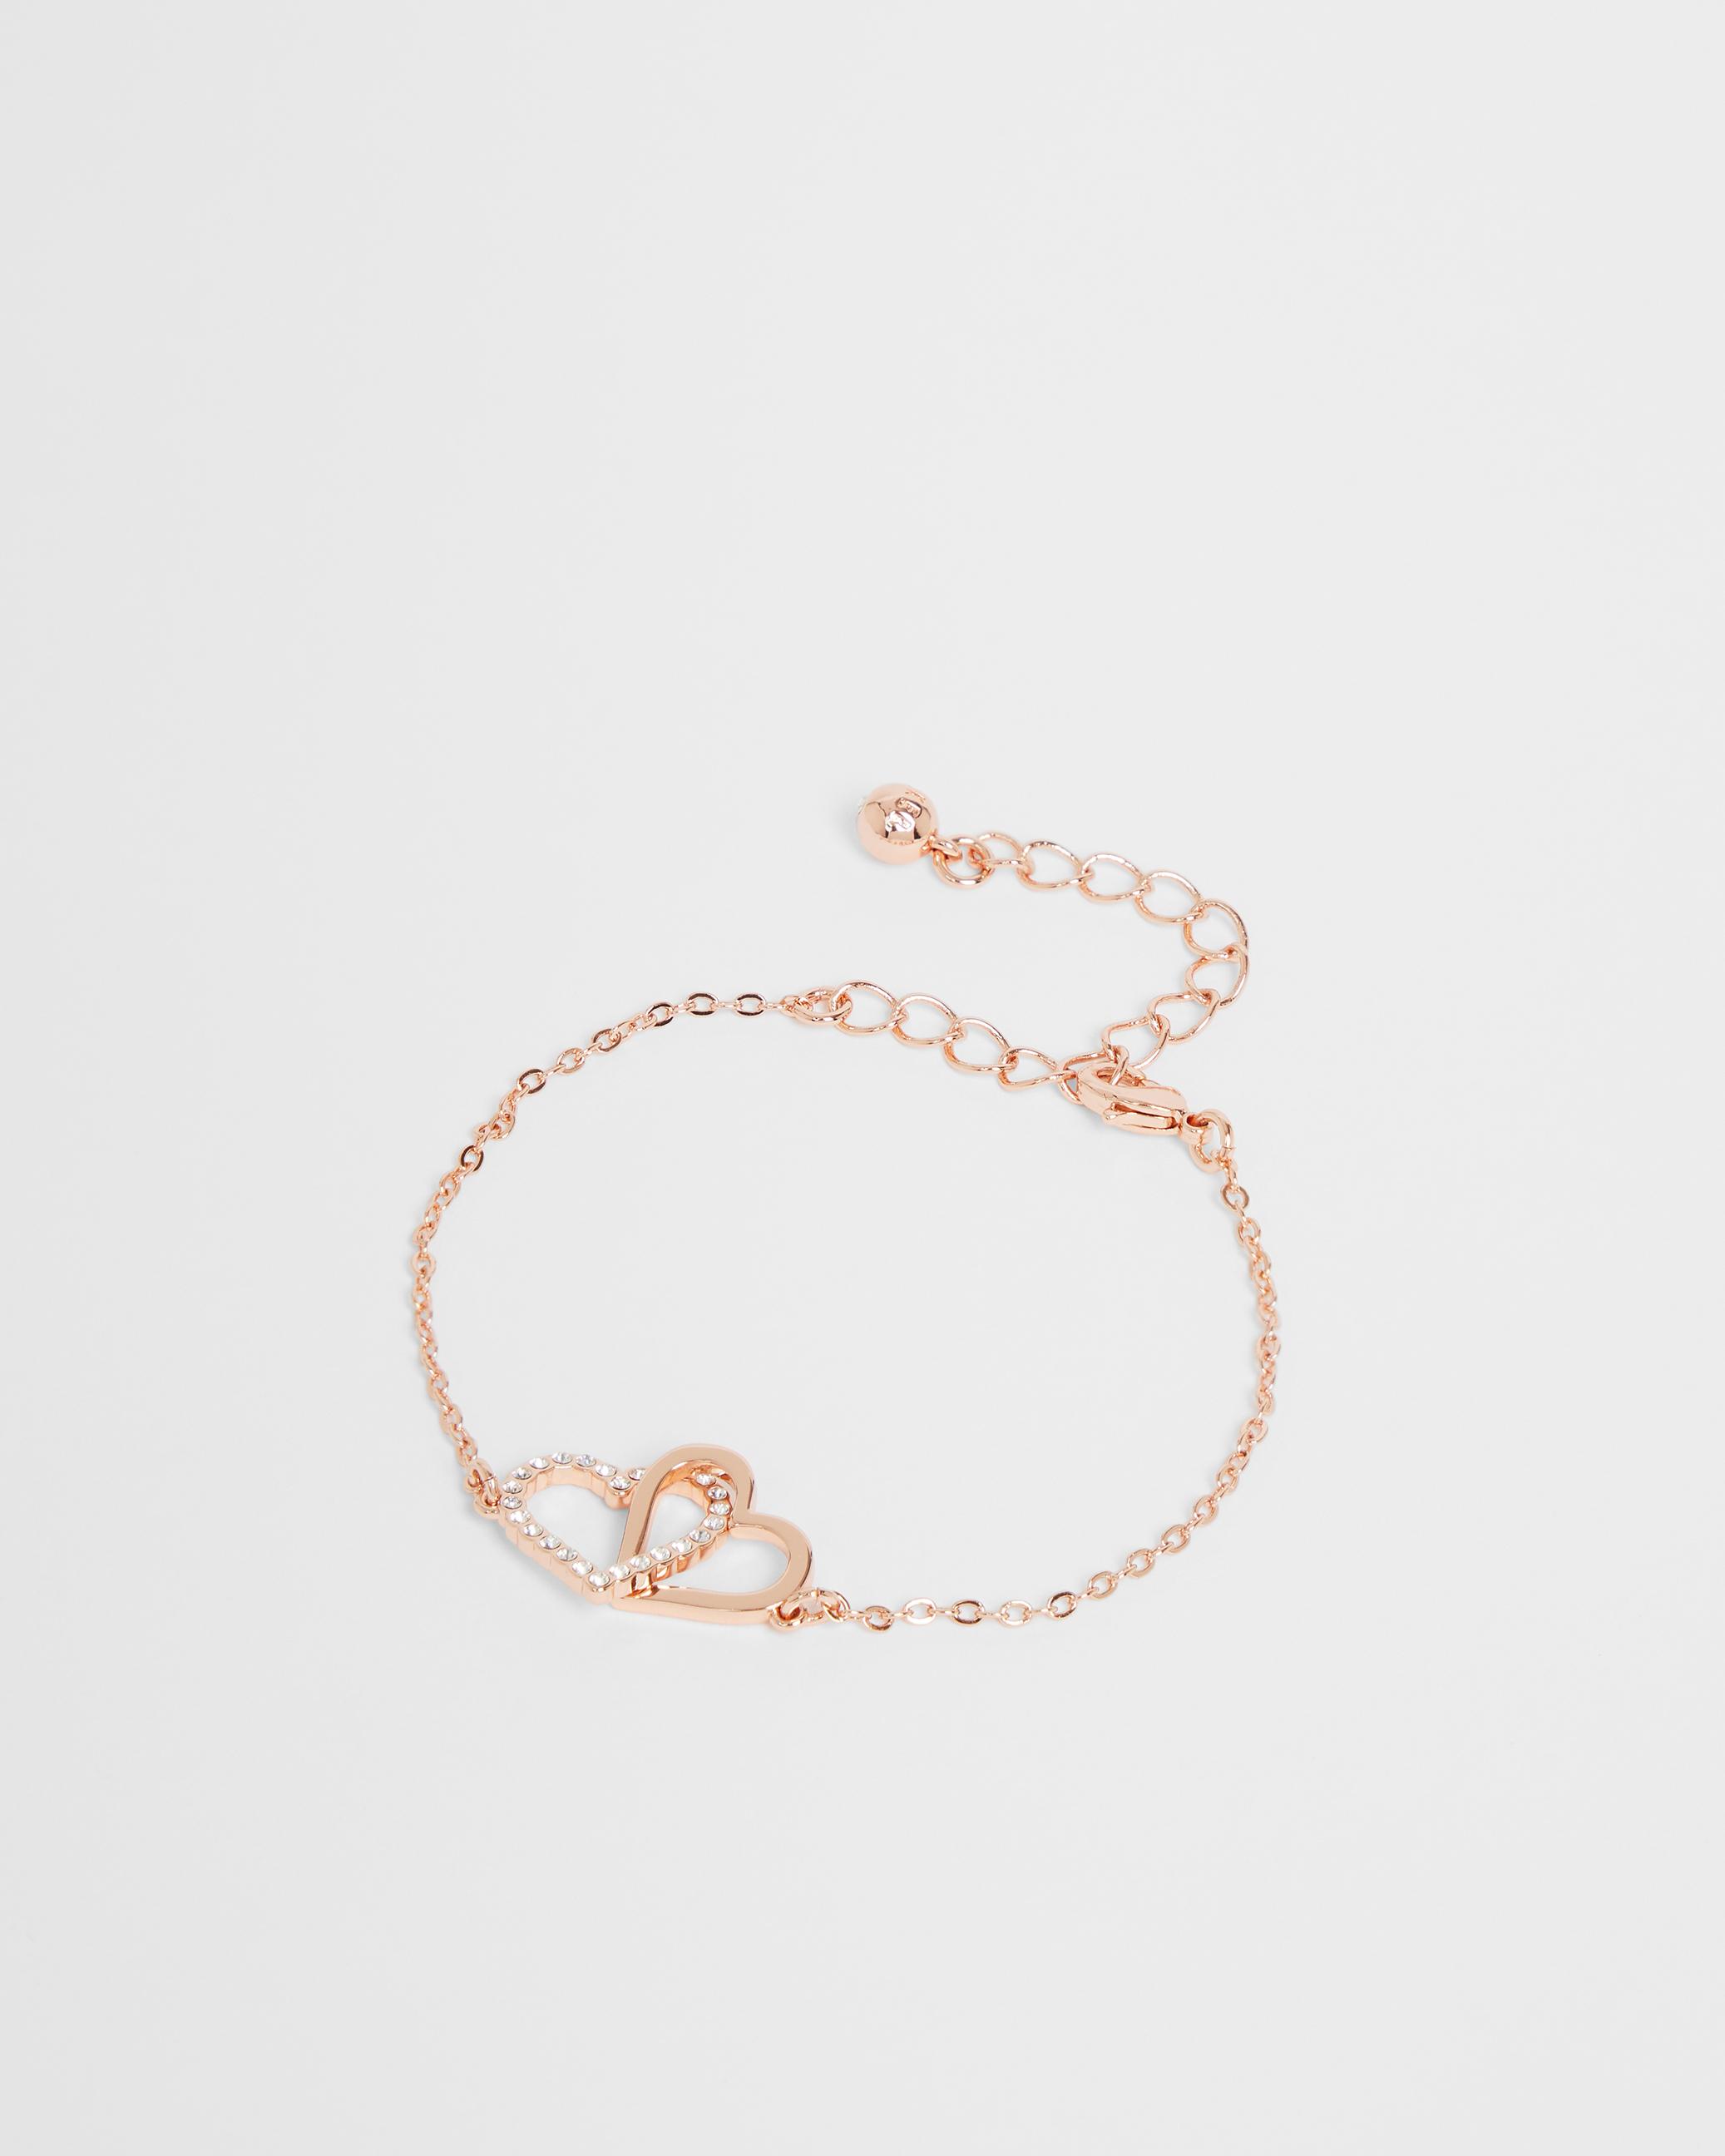 Linked hearts bracelet